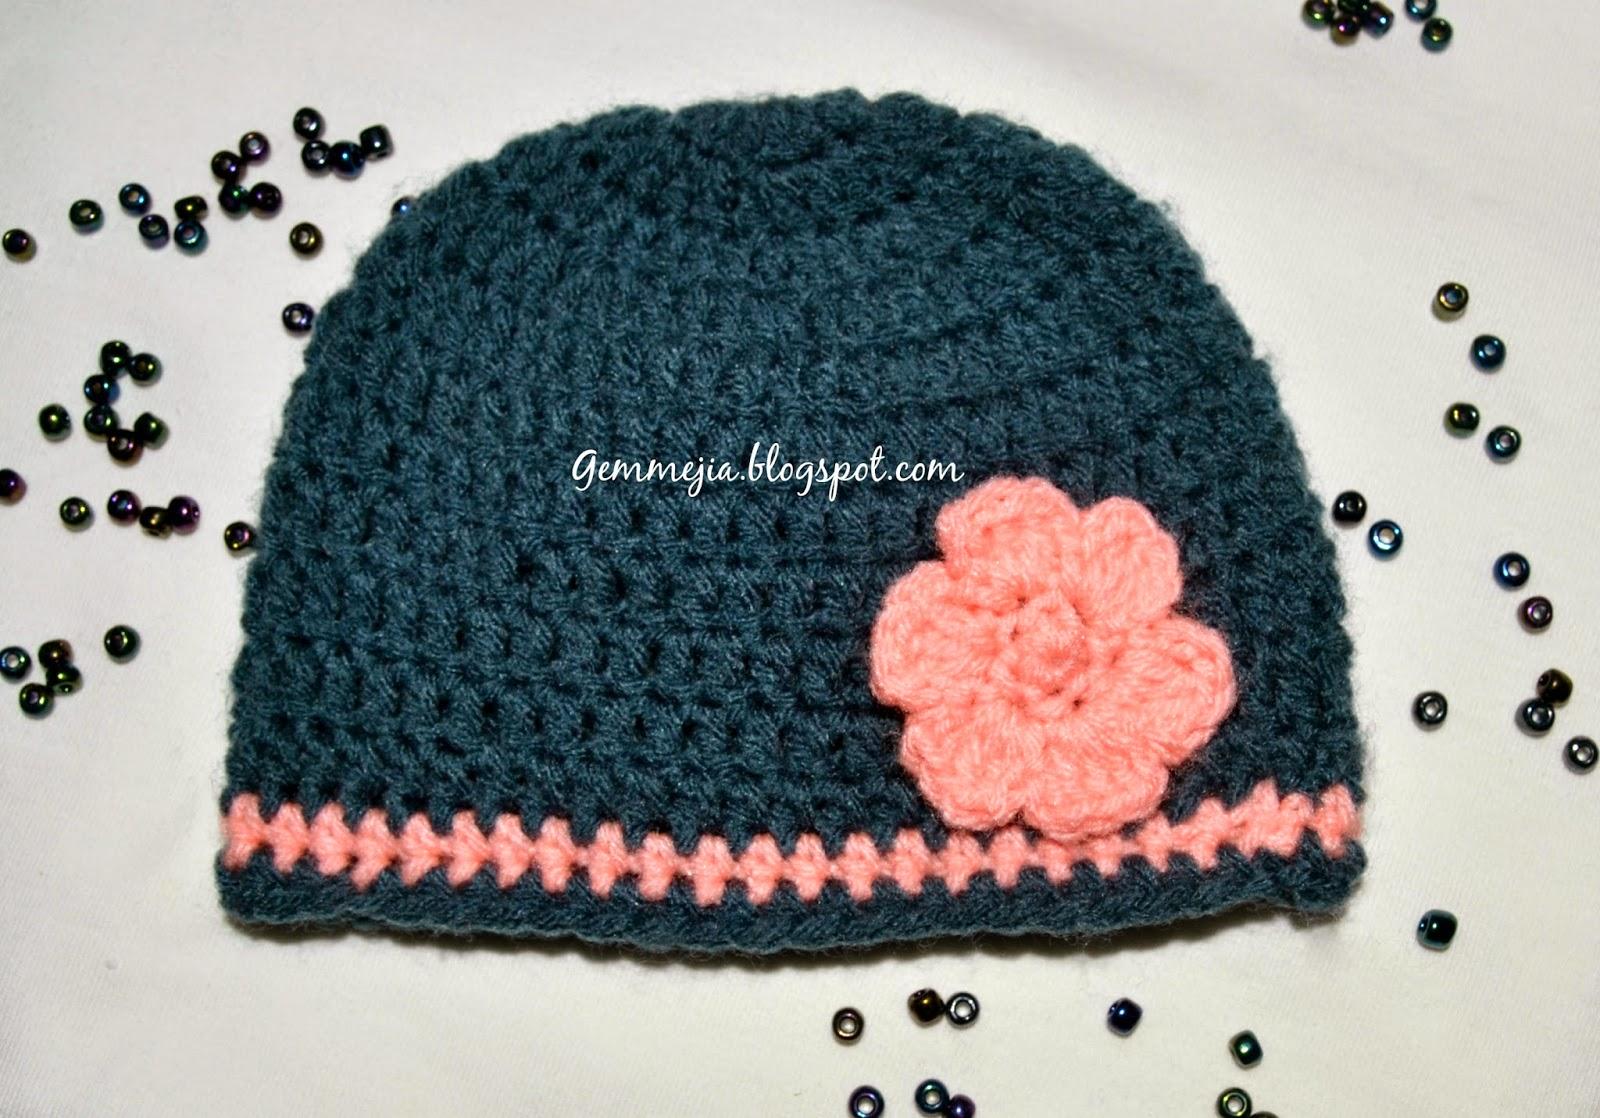 crochet baby beanies, crochet beanies, baby